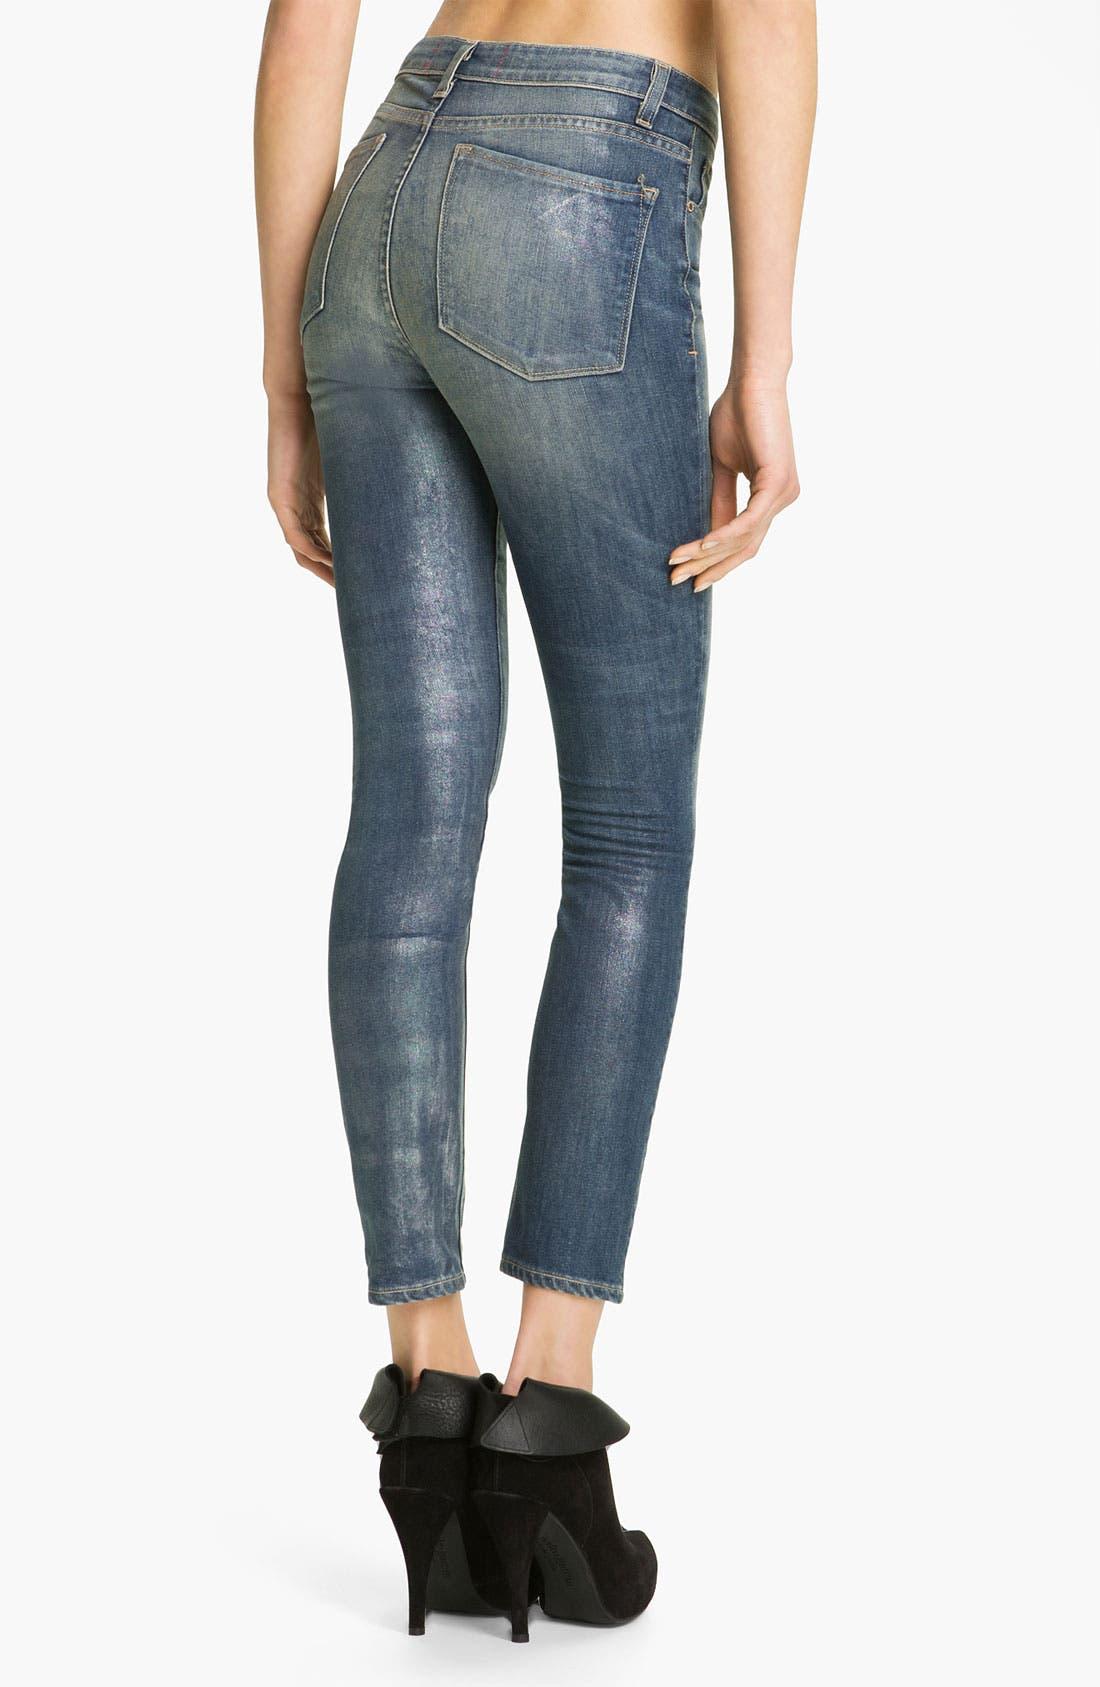 Alternate Image 2  - MARC BY MARC JACOBS 'Sofie' Cigarette Jeans (Vintage Pearl)